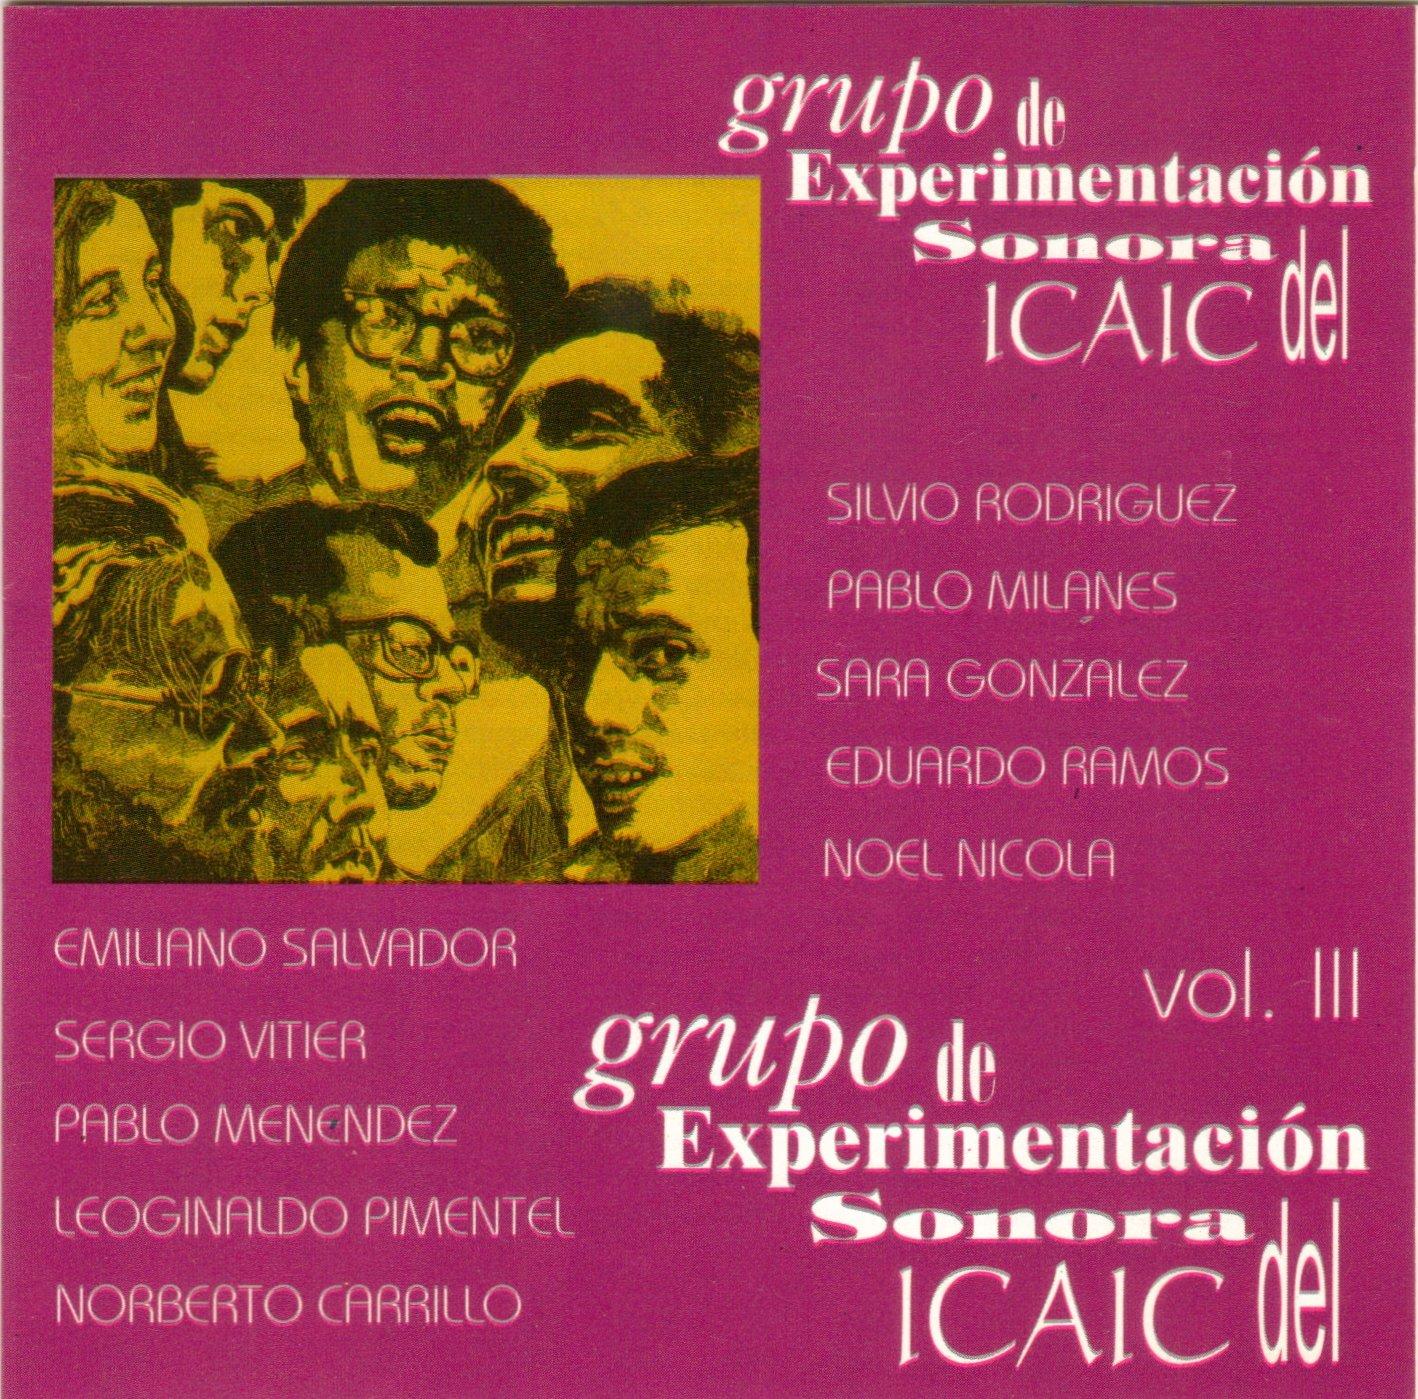 Amazon.com: GRUPO DE EXPERIMENTACION SONORA VOL. 3: Music